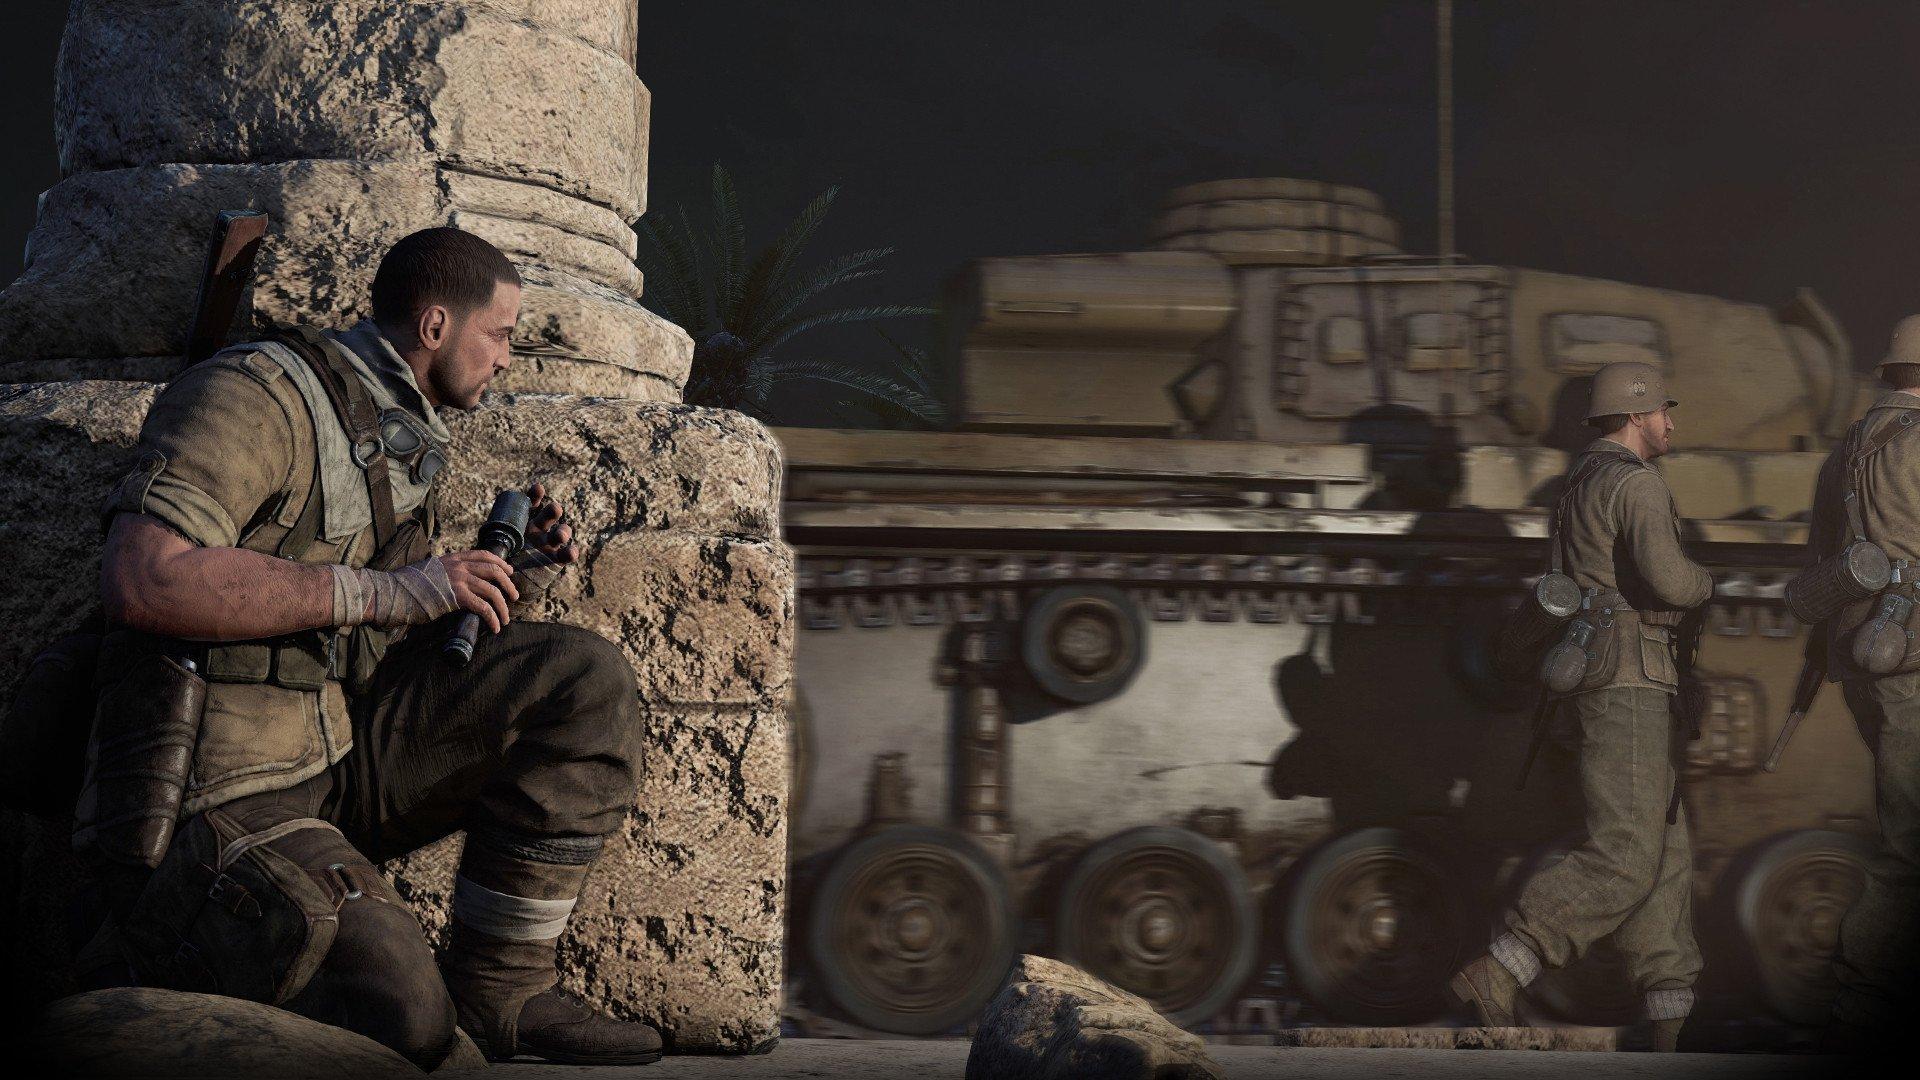 Sniper Elite 3 Wallpaper: SNIPER ELITE III Shooter Military Weapon Gun Tactical